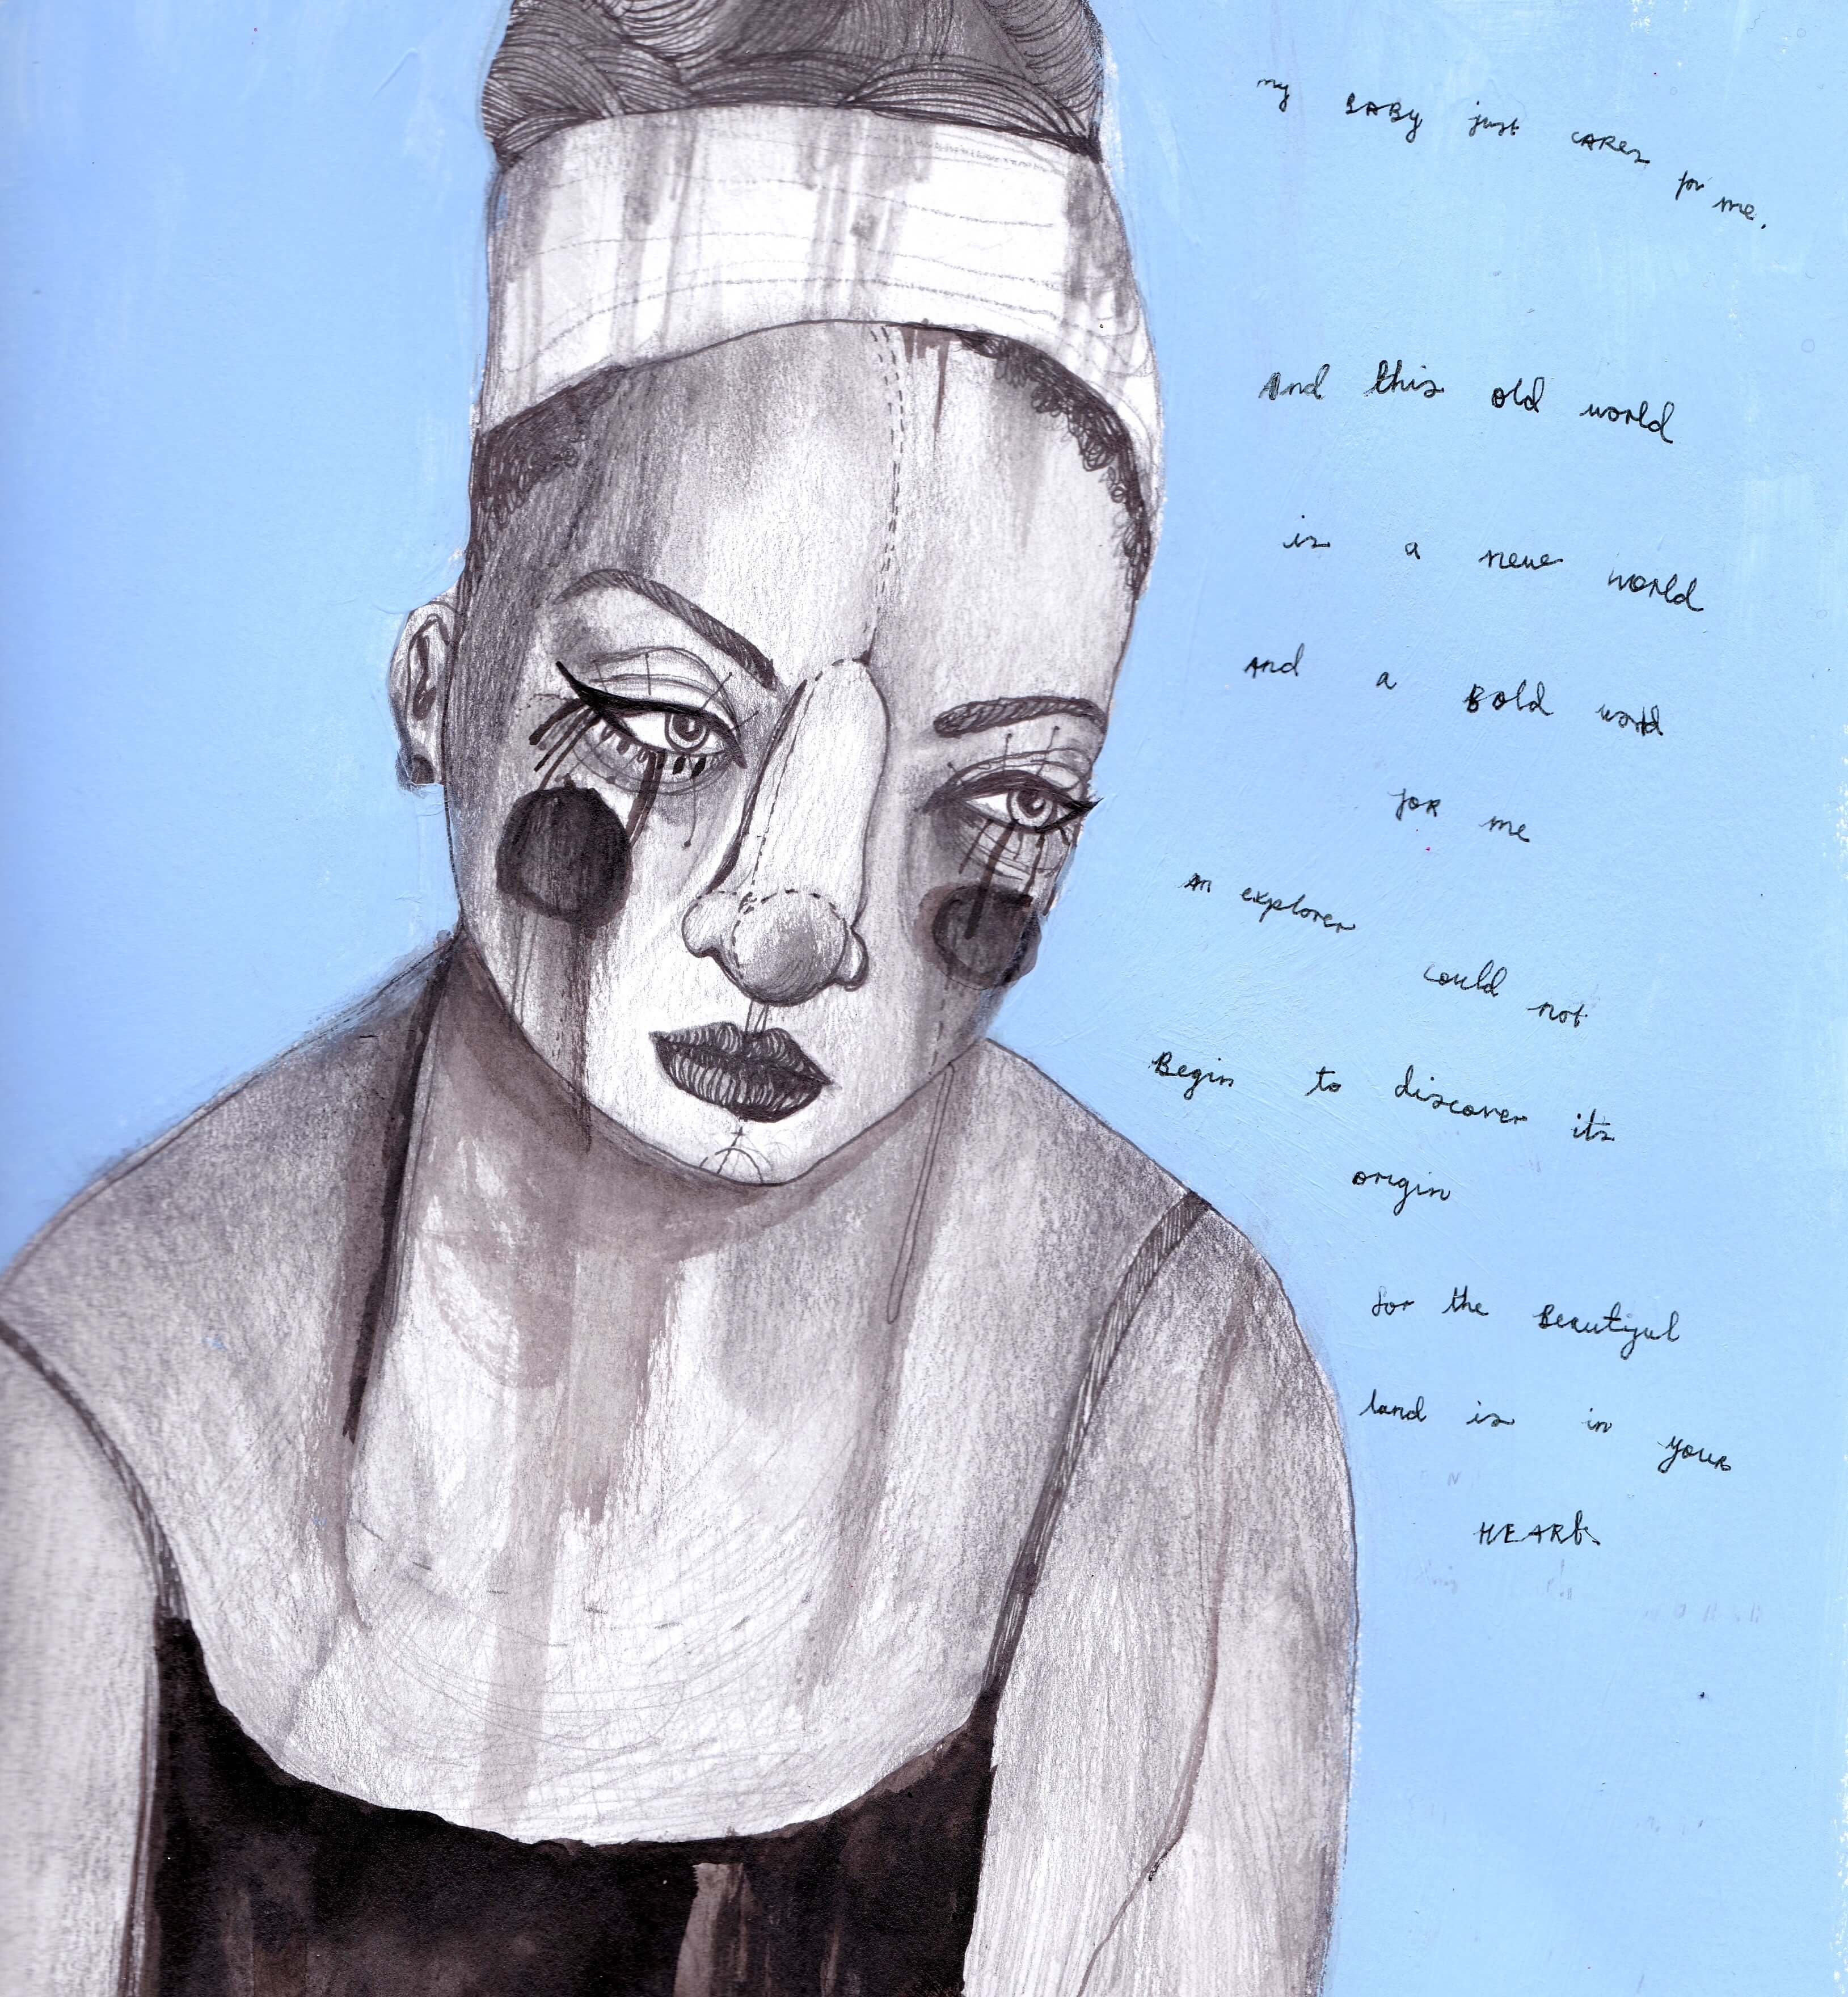 Illustration by Saffron Lily.